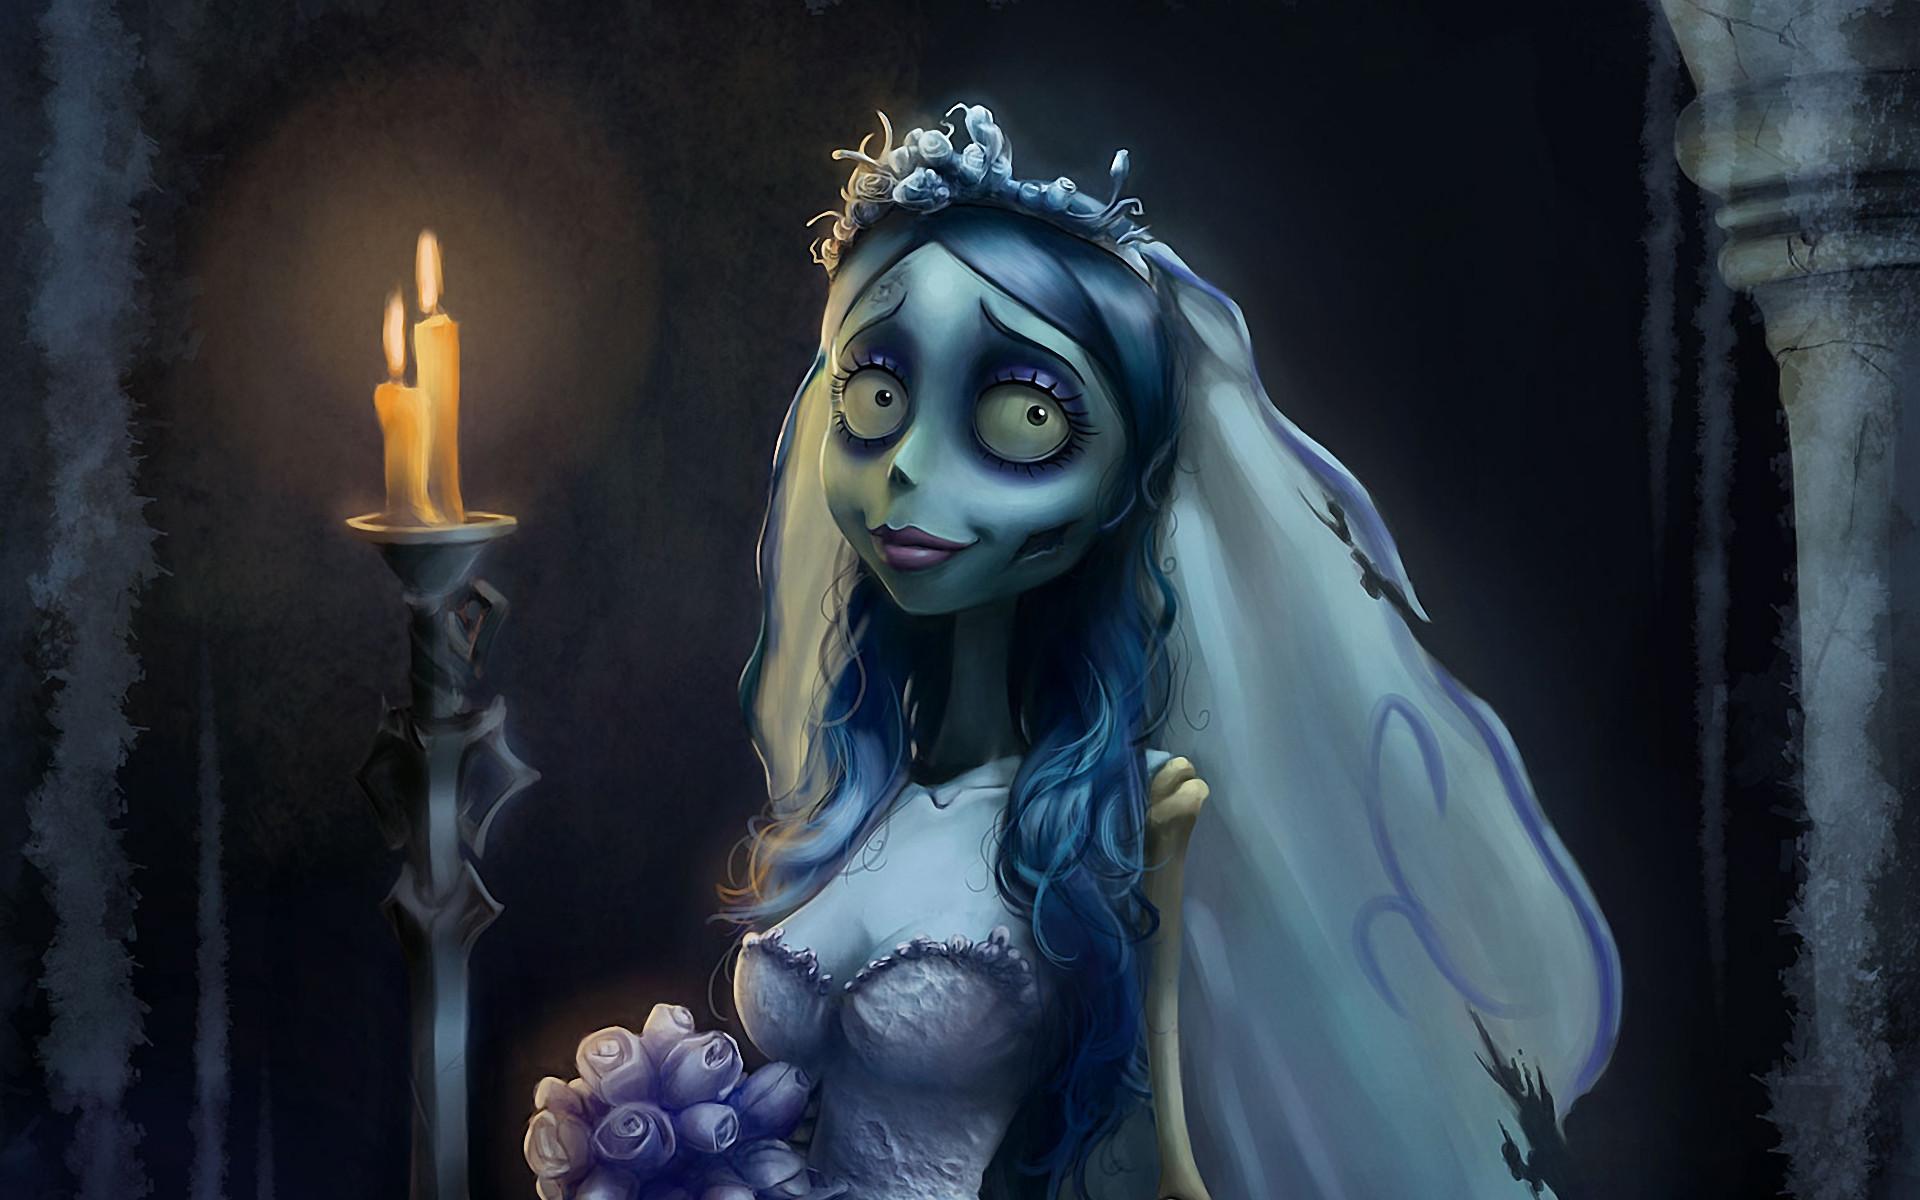 Corpse Bride Wallpaper 72+ images